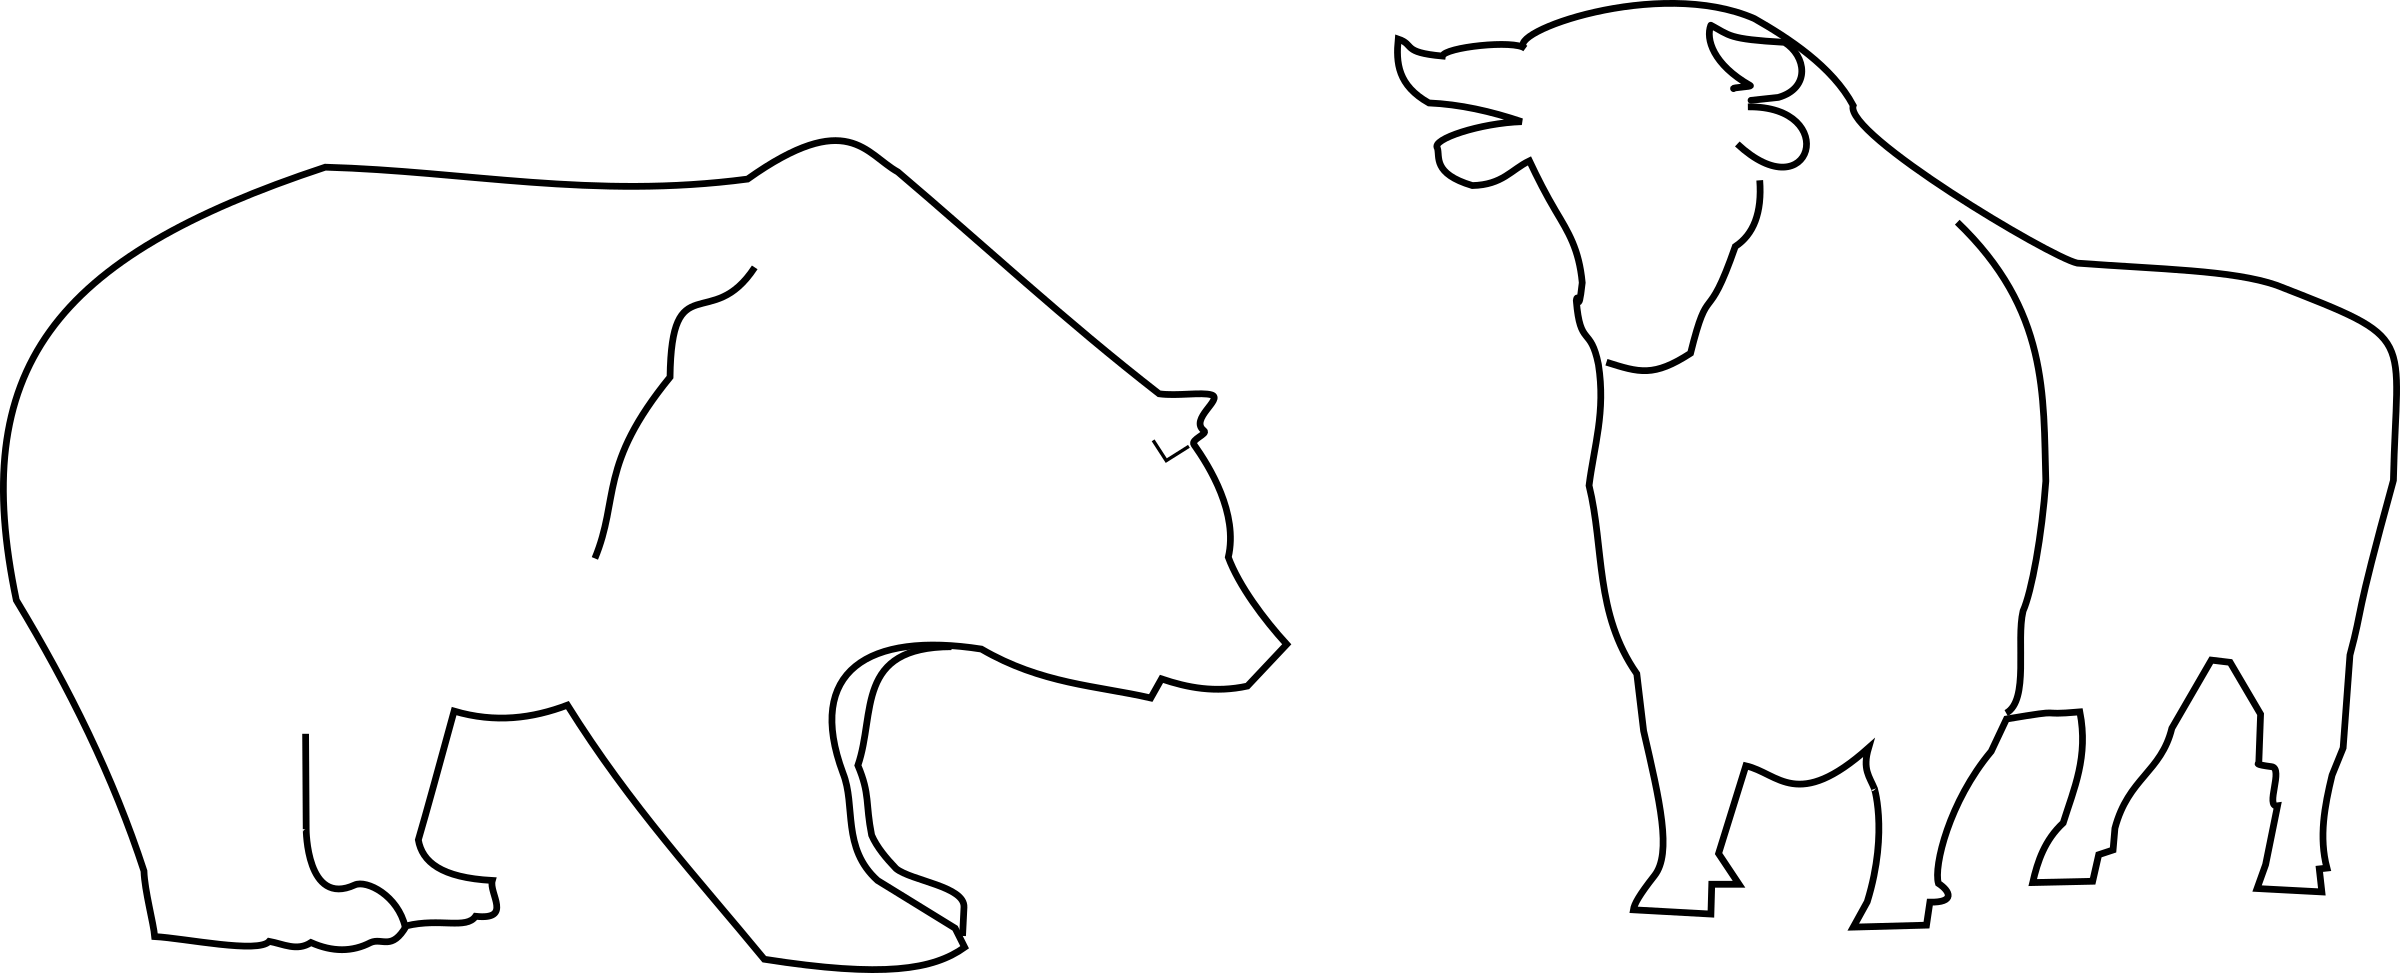 Bulls And Bear Vector Clipart Image